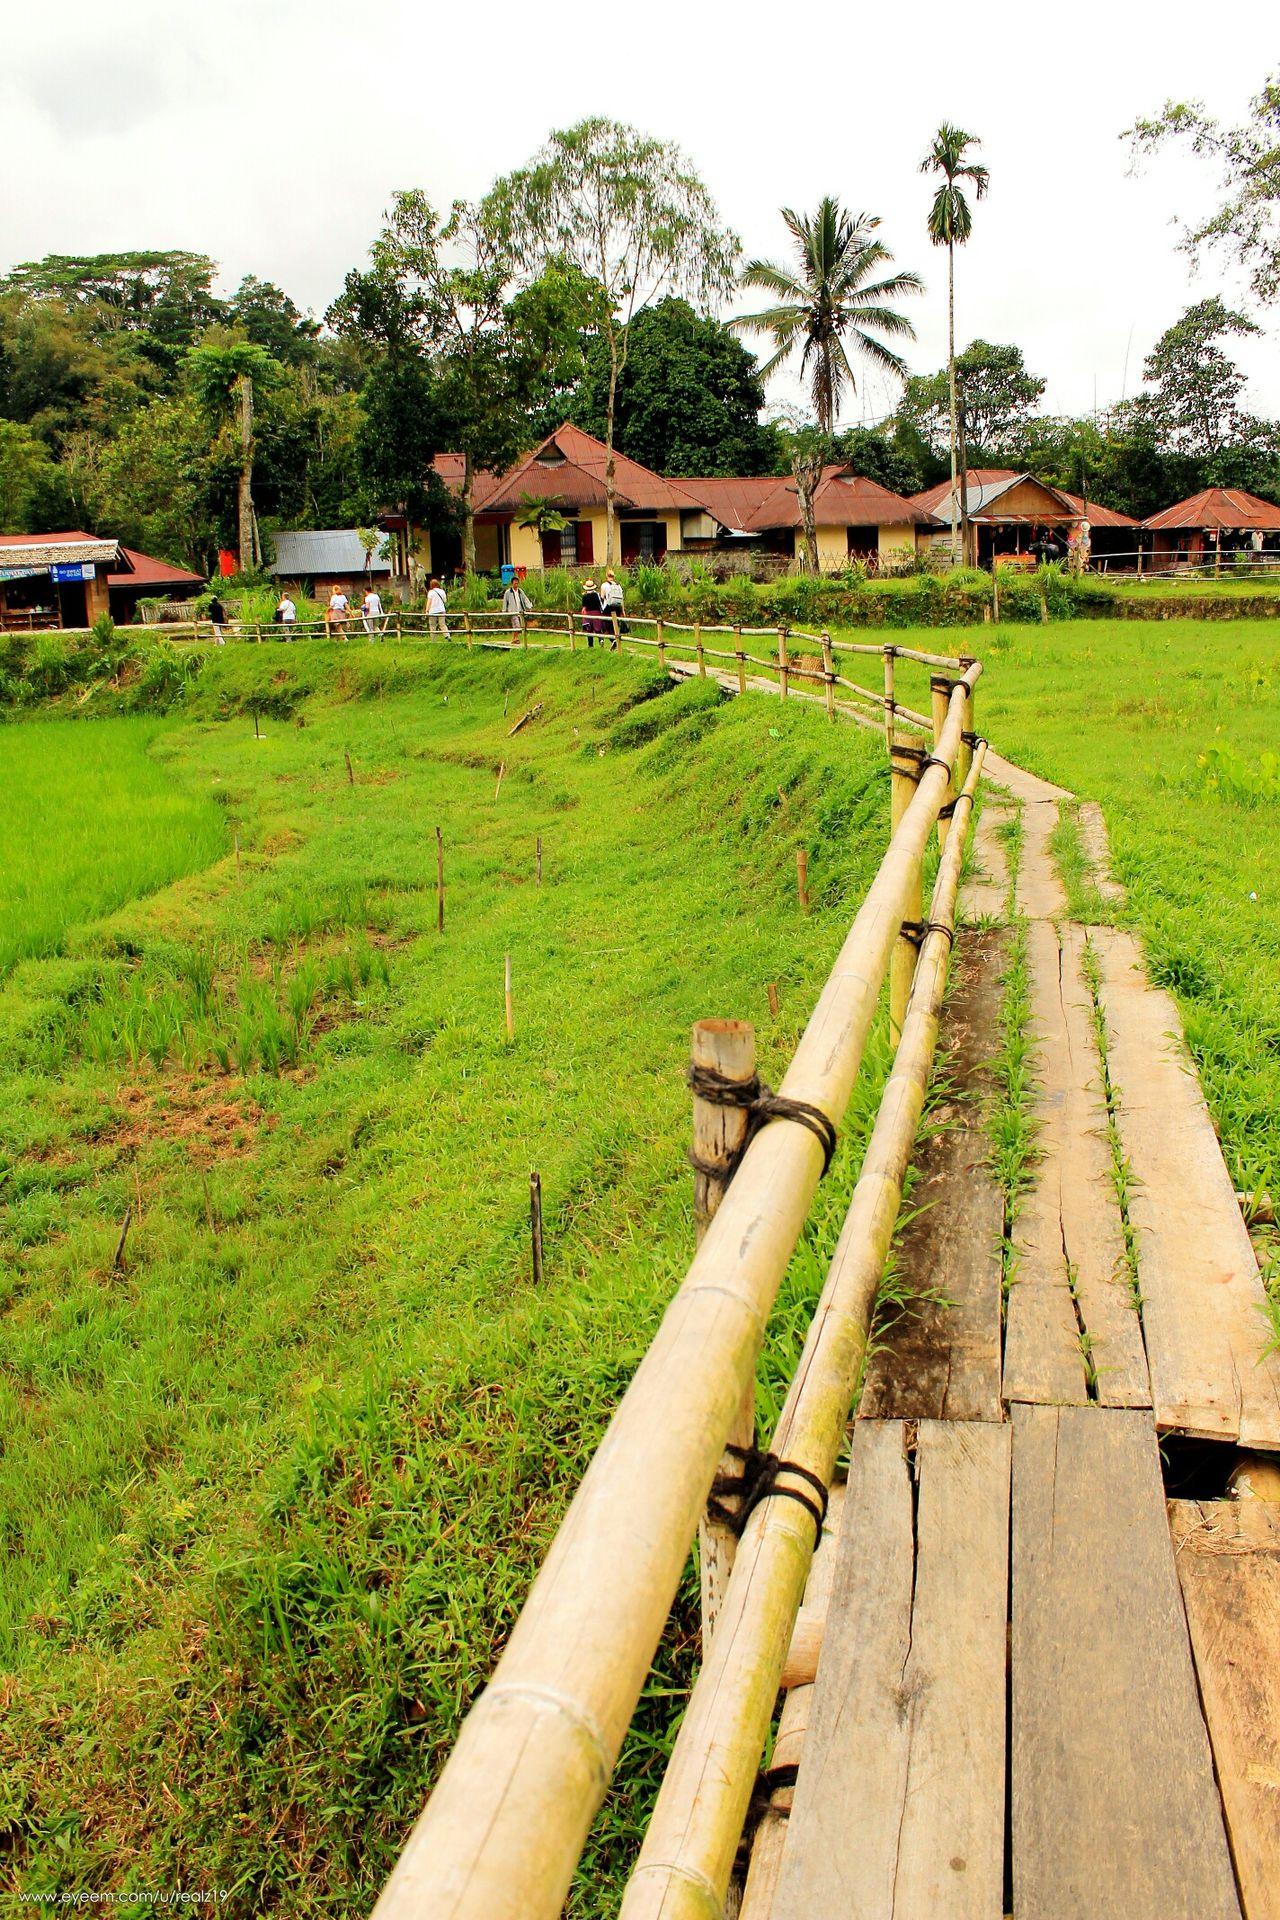 Grass Green Color Growth Outdoors Kete Kesu Rantepao Toraja Toraja Utara Travel Destinations INDONESIA